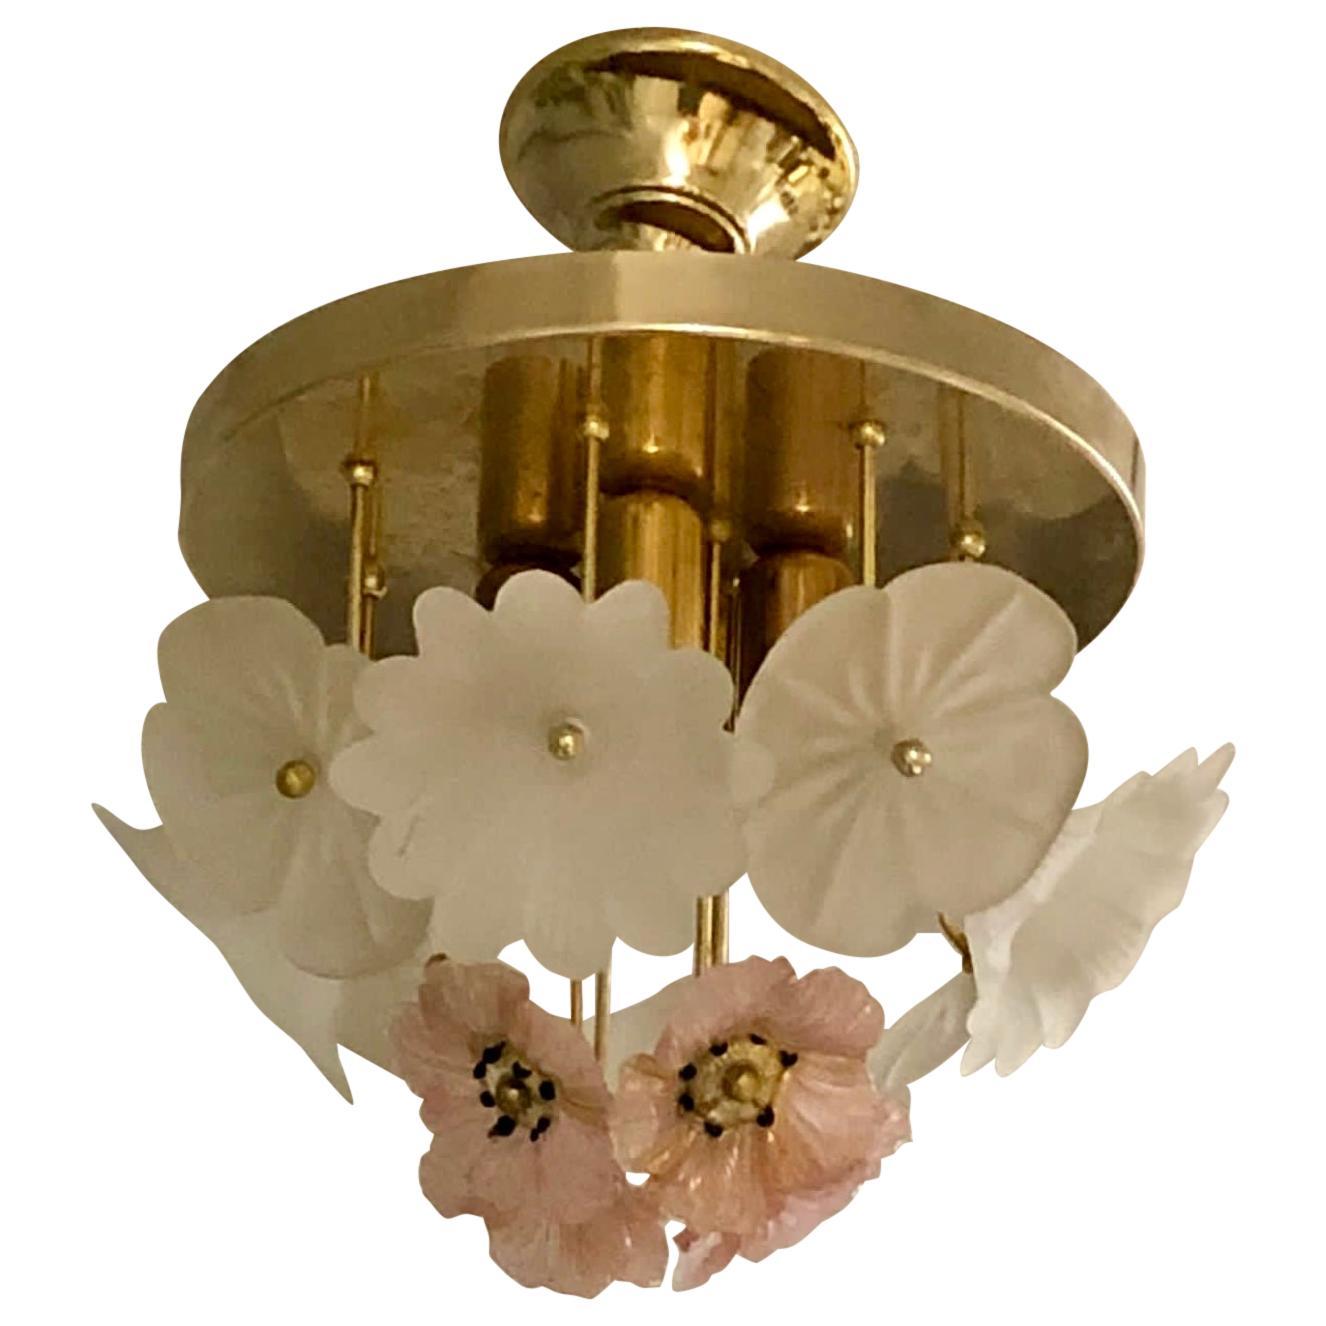 Vintage Barovier Murano Glass Flower Anemone Ceiling Light, Italy, 1970s